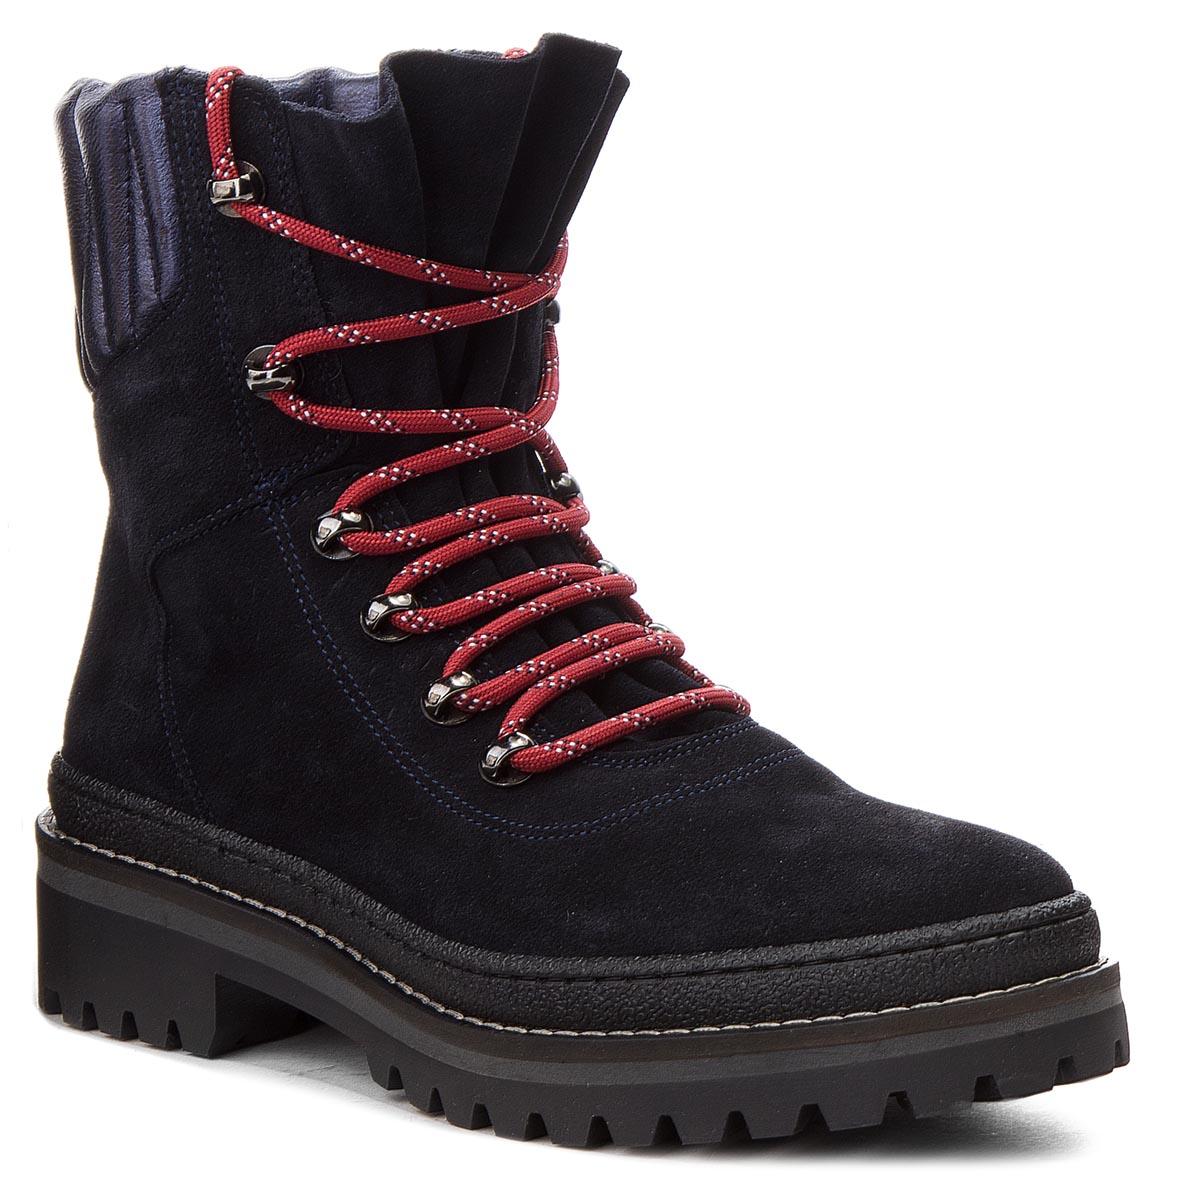 1c719bd1fd64 Hiking Boots TOMMY HILFIGER